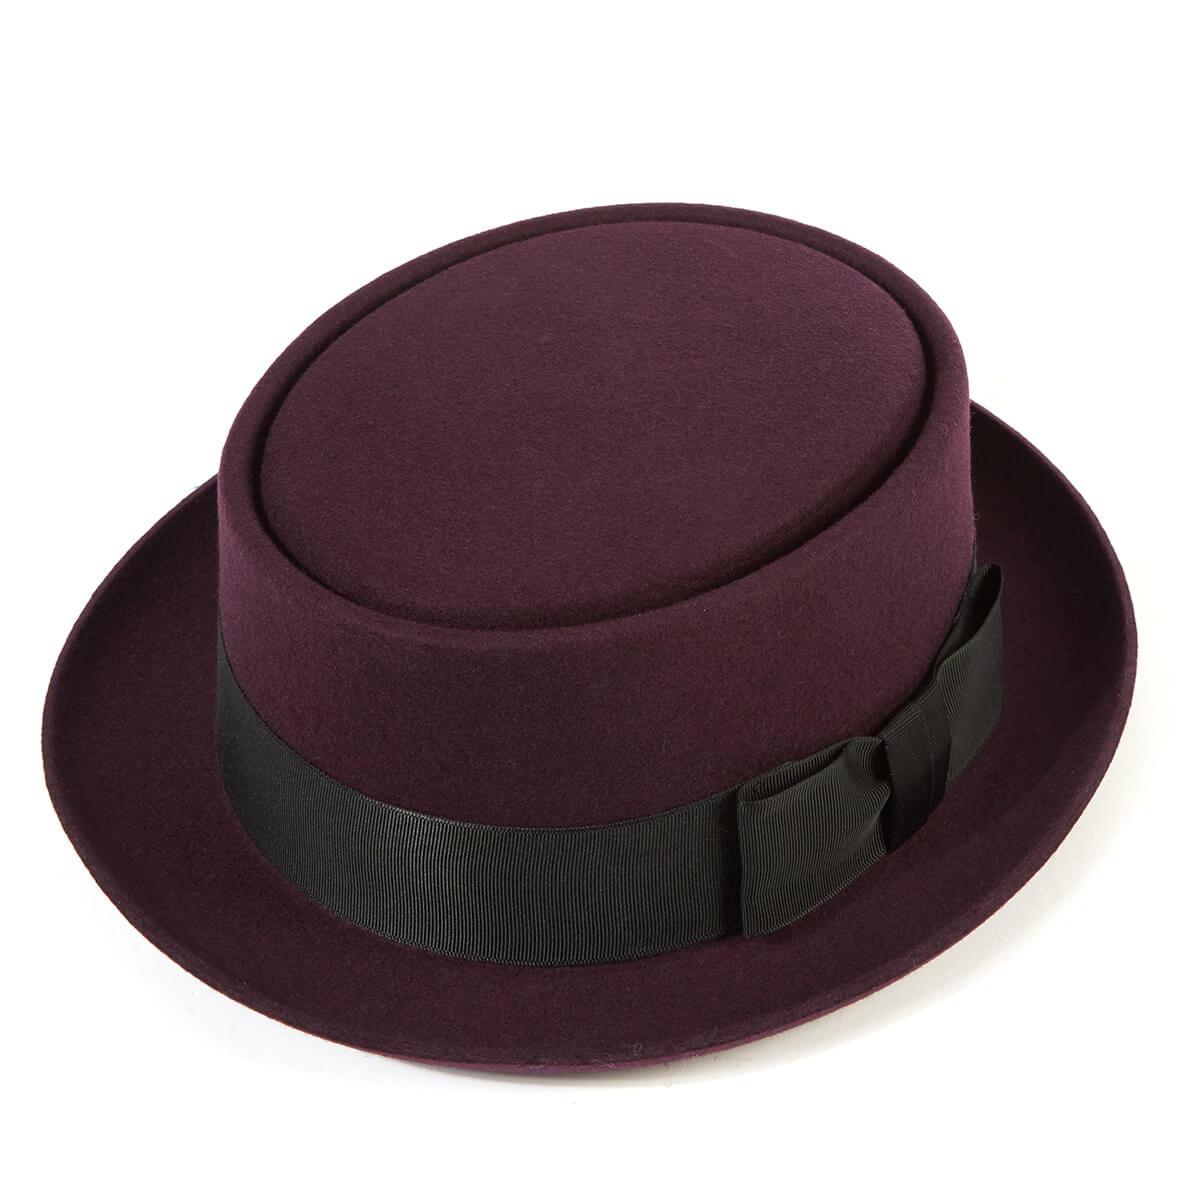 Pork Pie Wool Felt Trilby Hat - Berry in Size 59cm